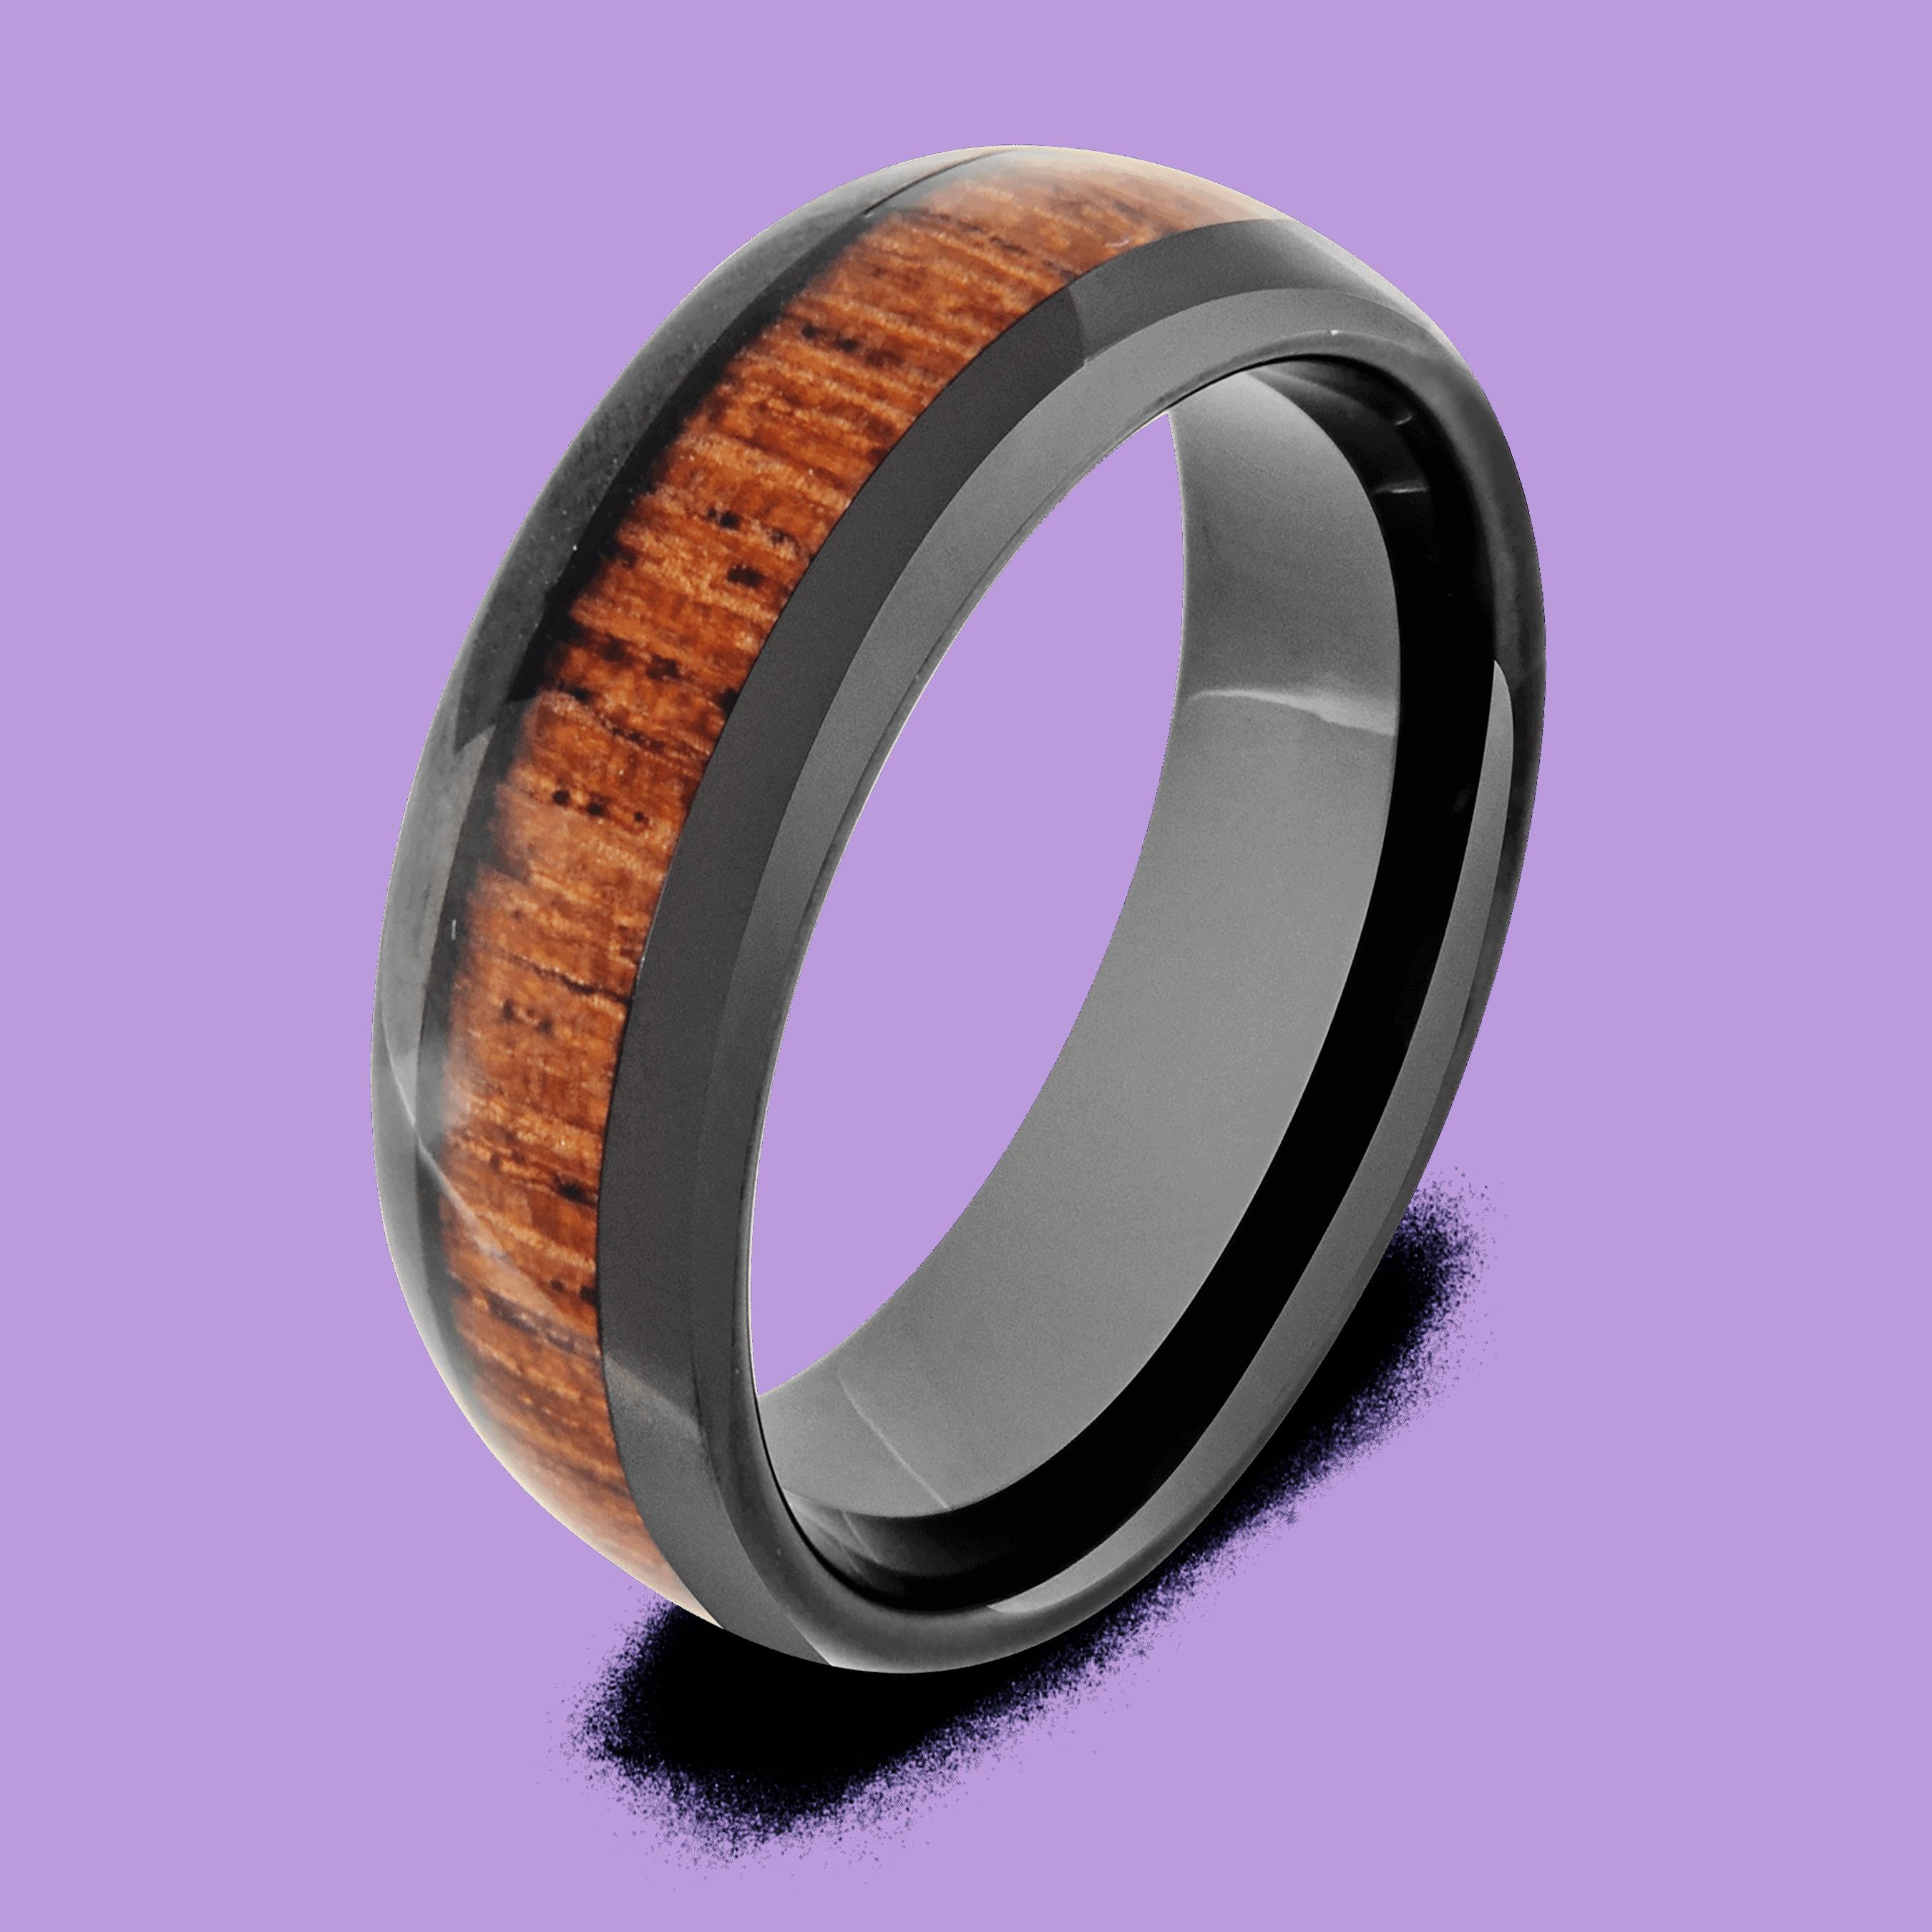 Black Ring with Natural Wood Inlay